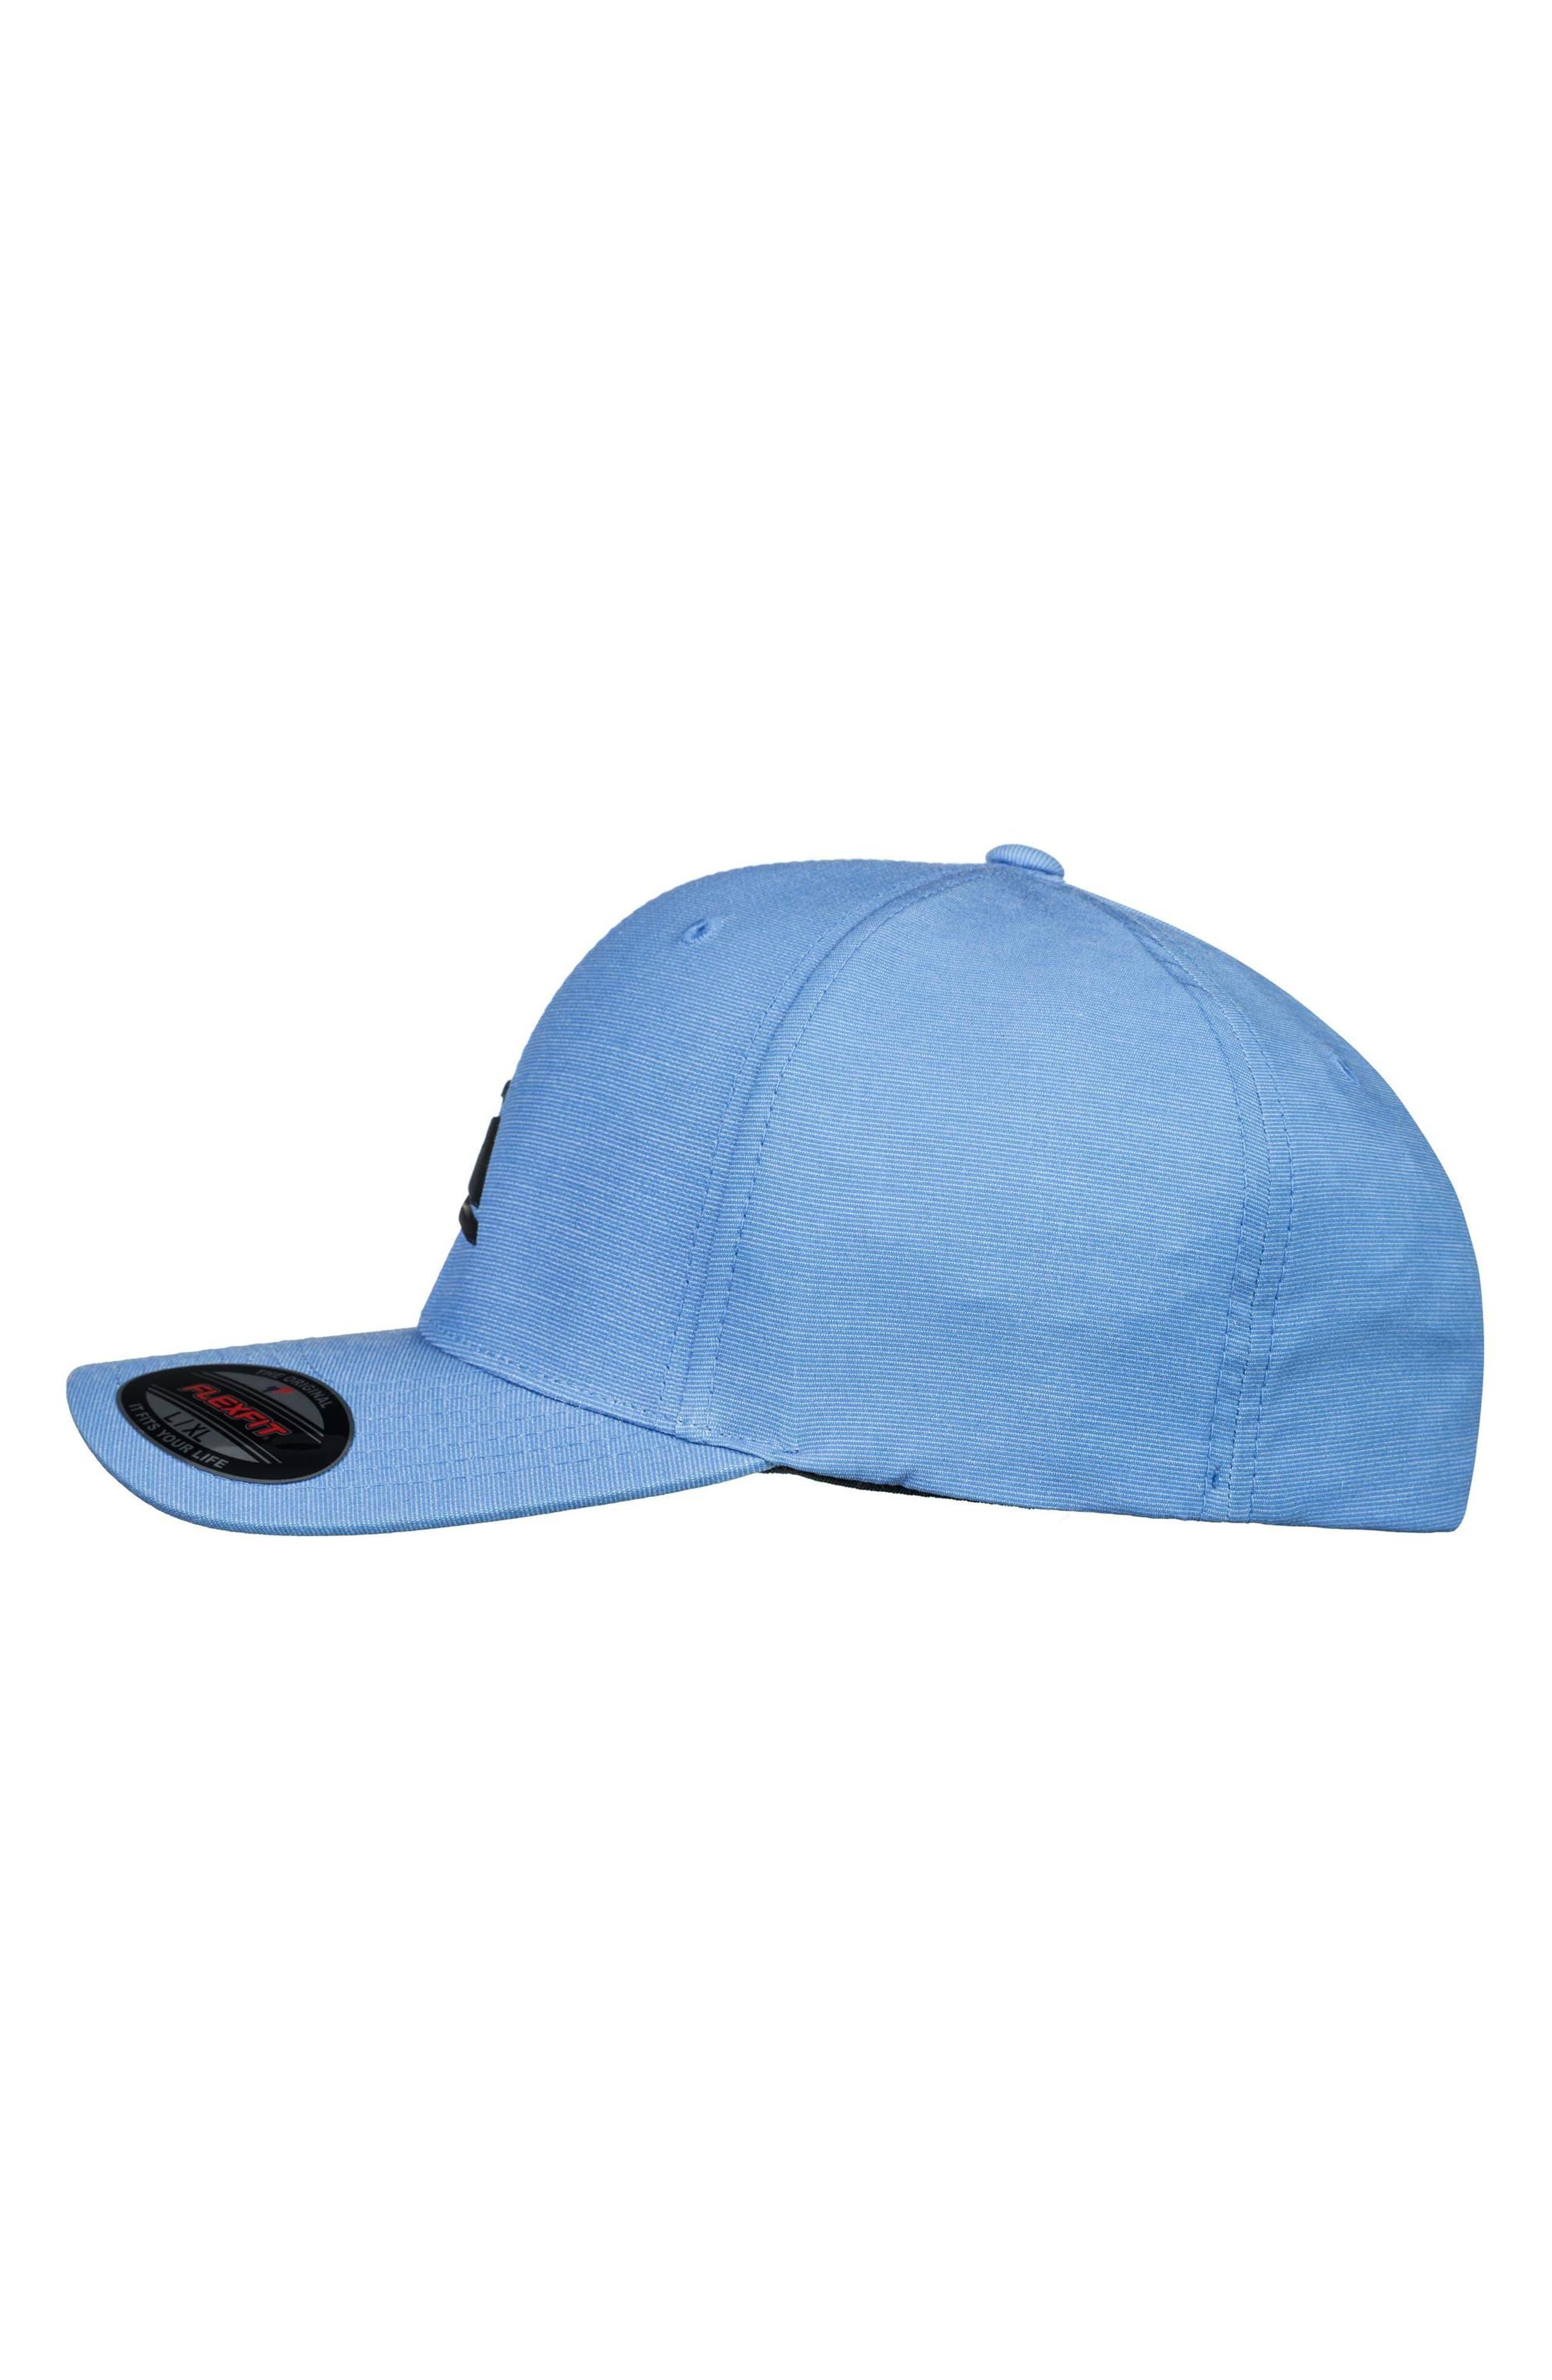 Texturizer Flexfit Ball Cap,                             Alternate thumbnail 4, color,                             SILVER LAKE BLUE